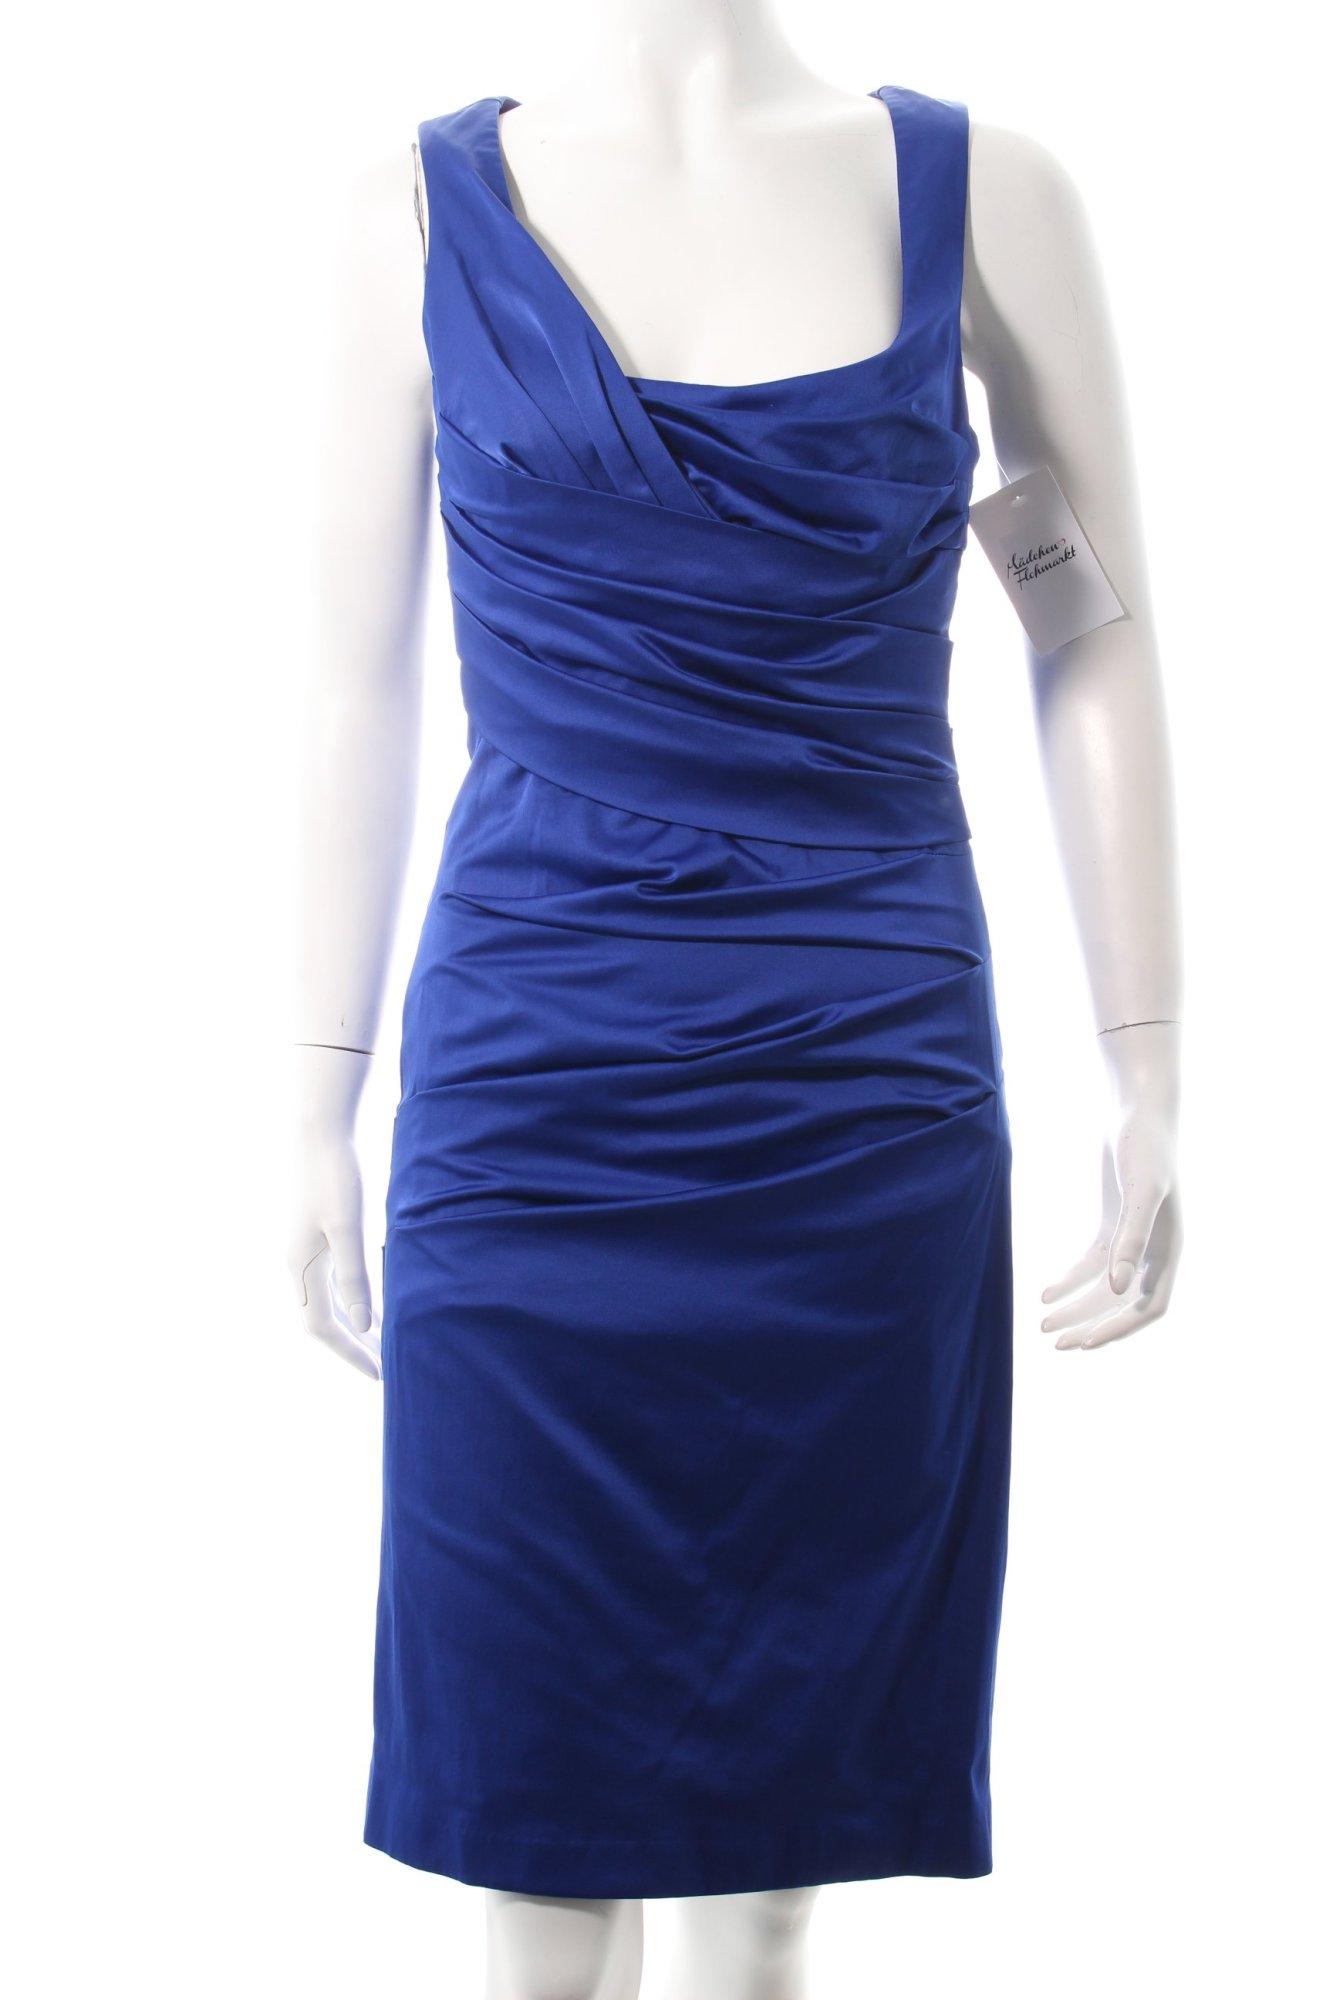 vera mont cocktailkleid blau eleganz look damen gr de 36. Black Bedroom Furniture Sets. Home Design Ideas